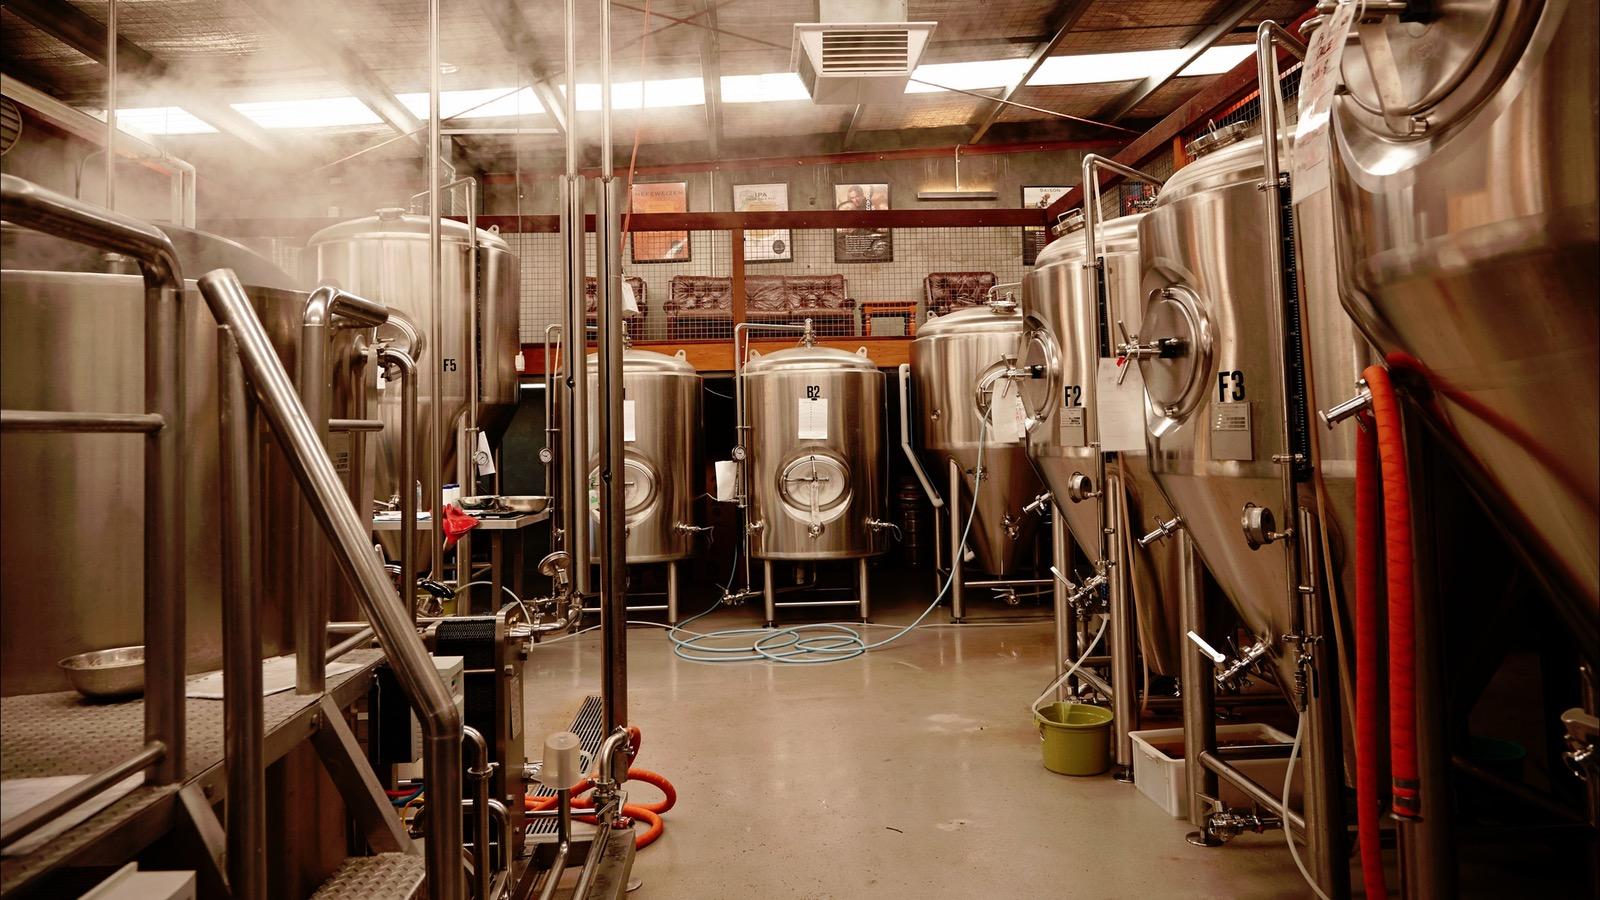 Mornington Peninsula Brewery Brew floor